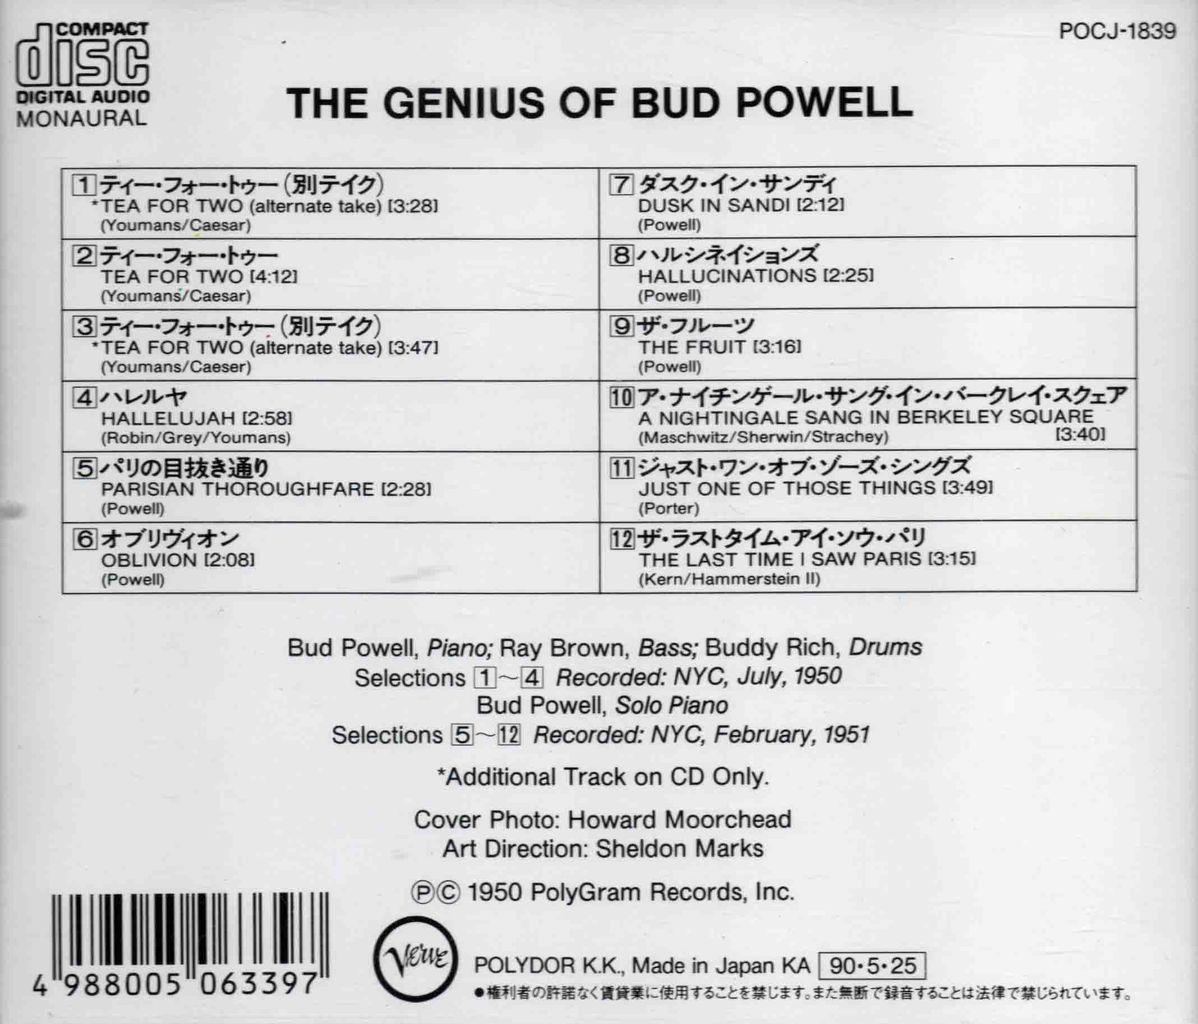 THE GENIUS OF BUD POWELL-2